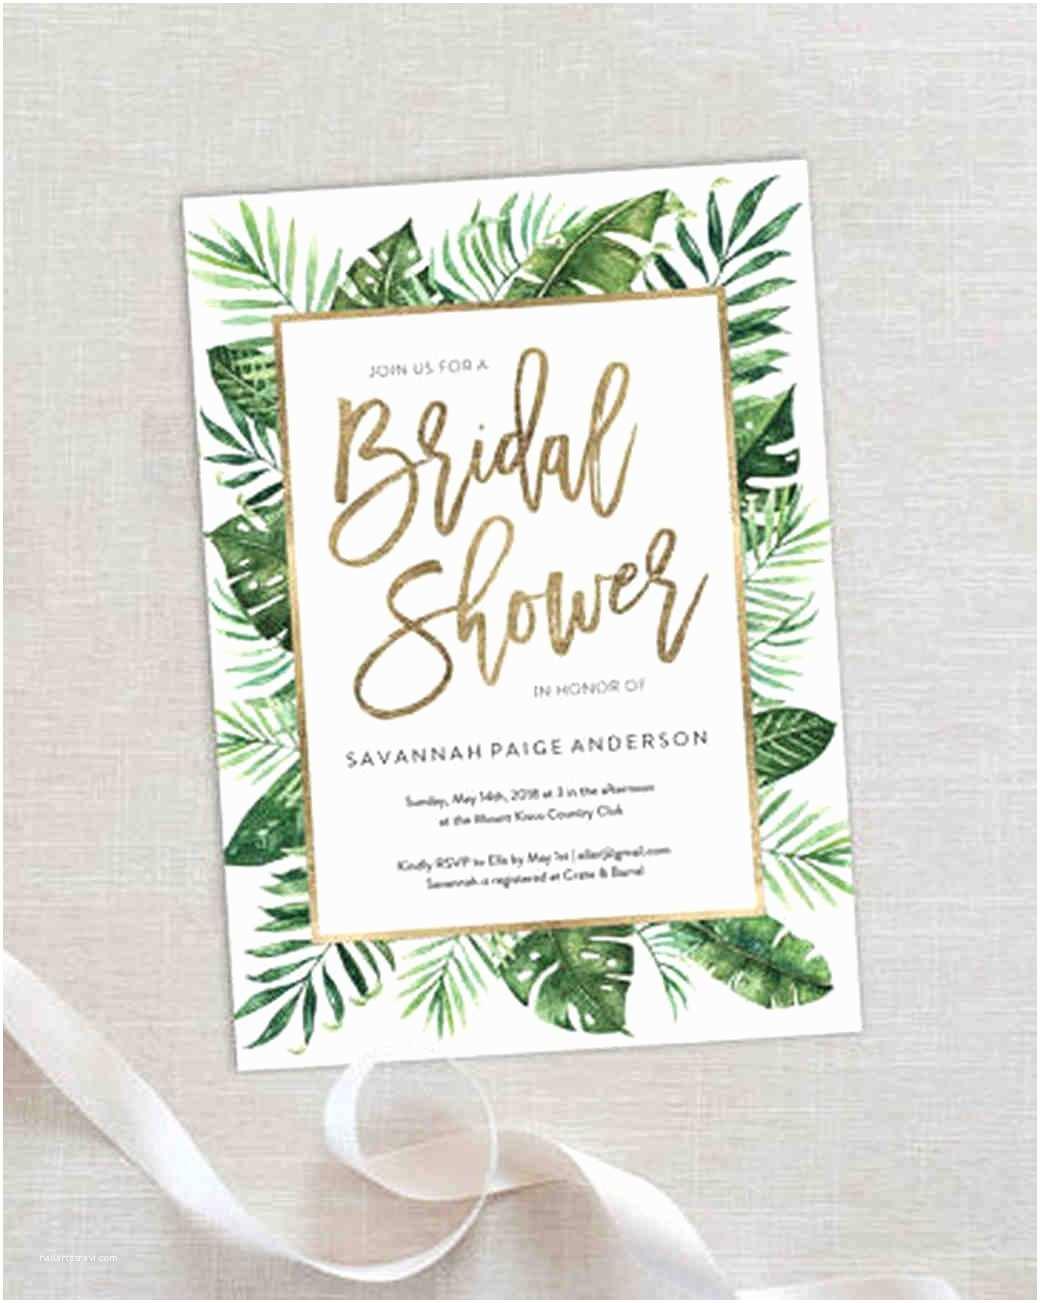 Cheap Wedding Shower Invitations Dorable Cheap Wedding Shower Invitations Sketch